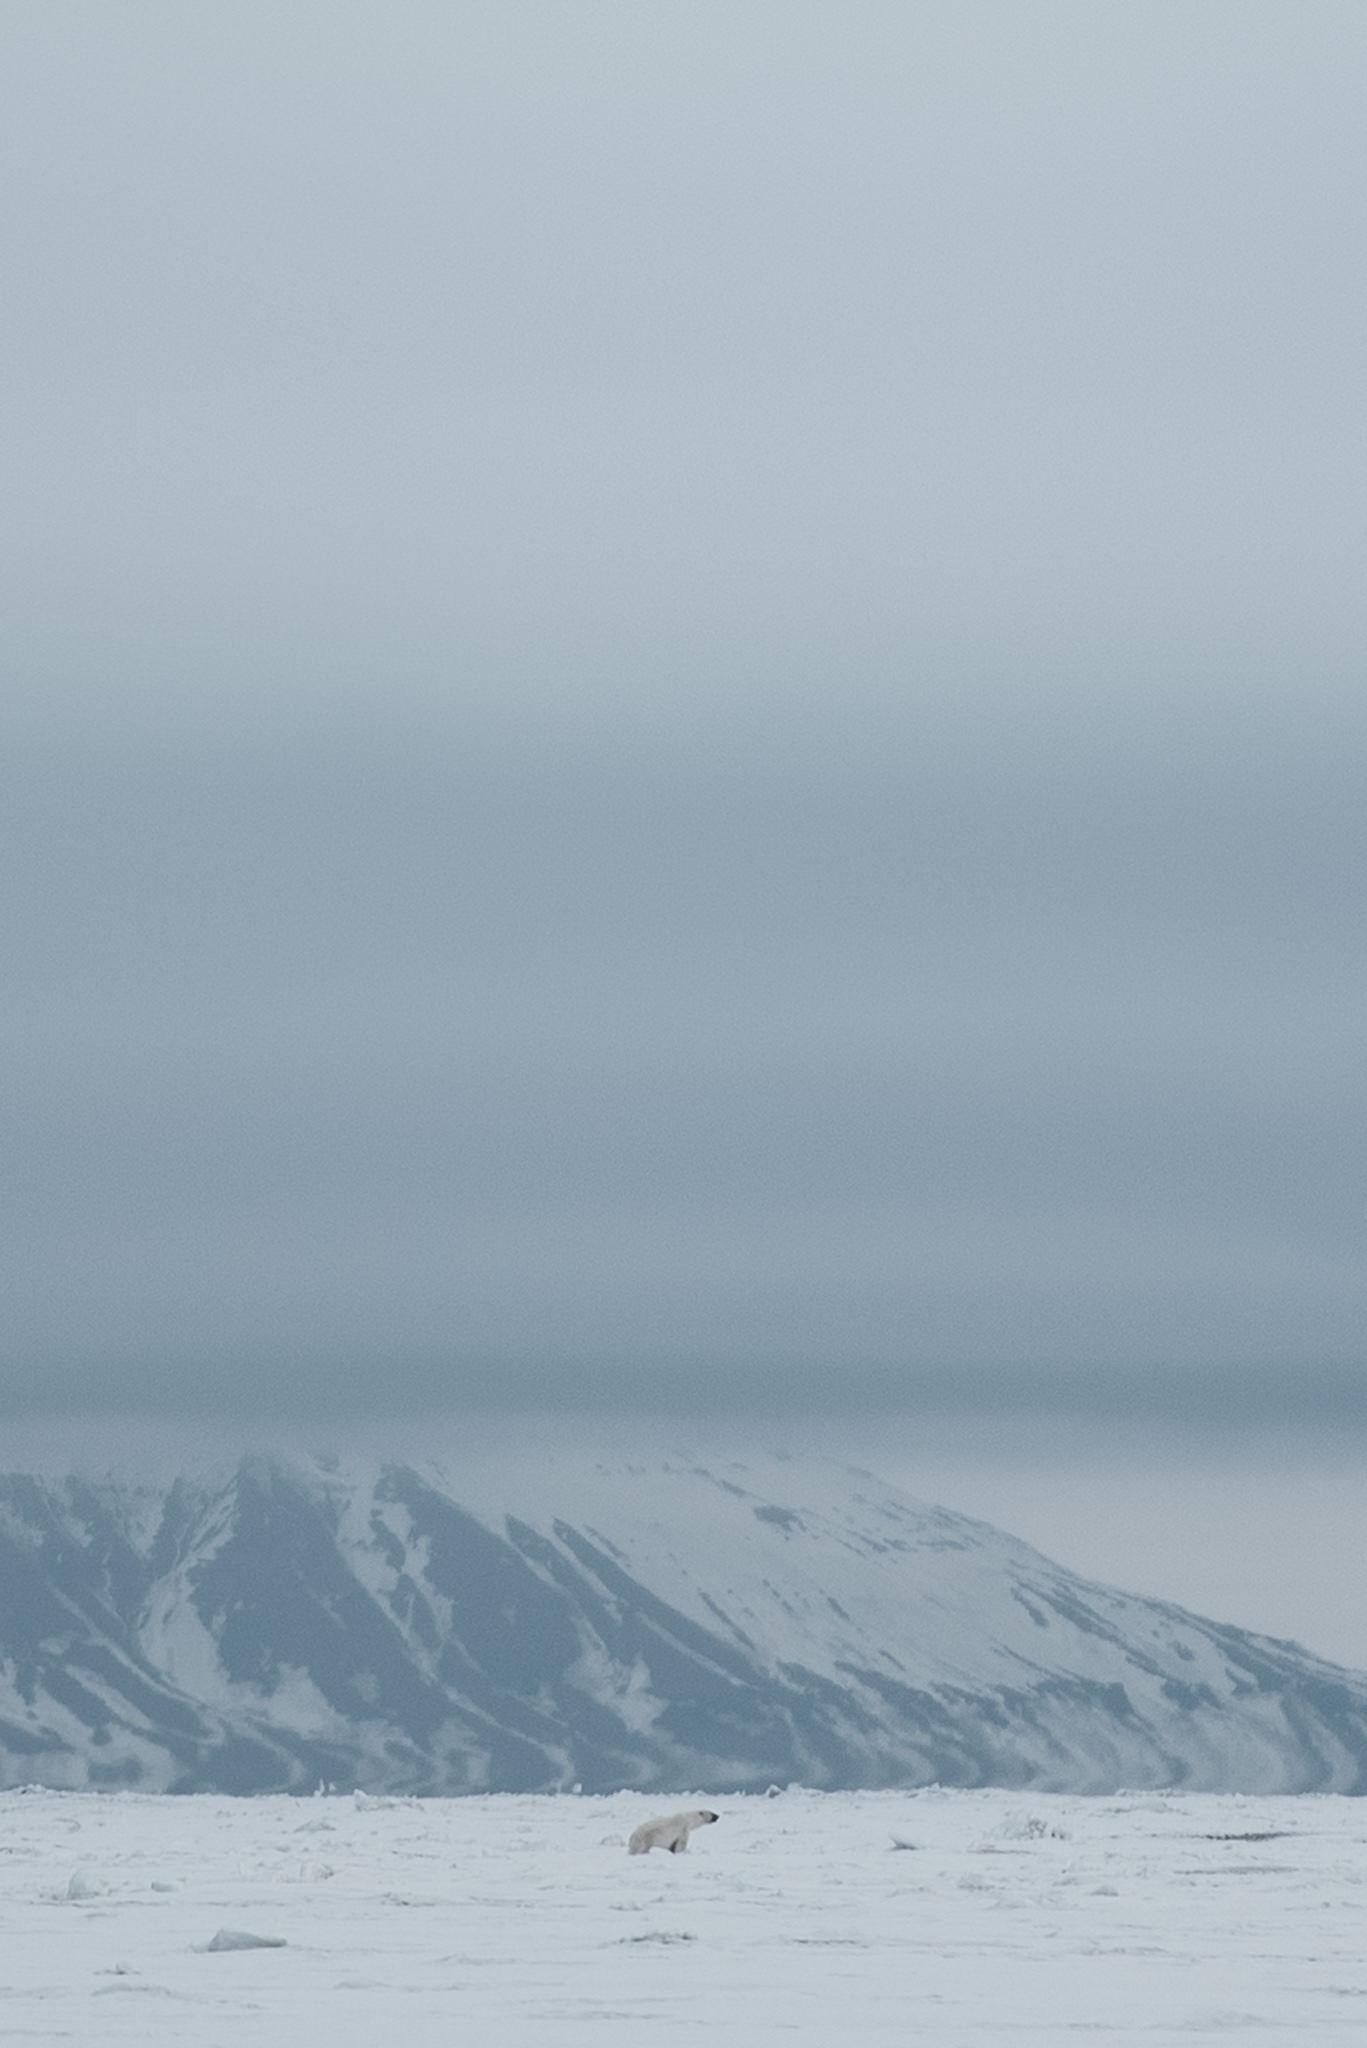 Copy of polar bear on Svalbard